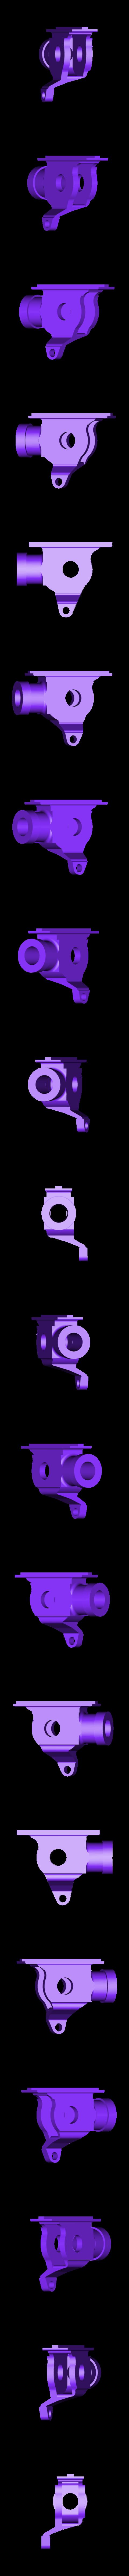 crosshead_-_LEFT.STL Download free STL file 4-8-8-4 Big Boy Locomotive • 3D printer object, RaymondDeLuca